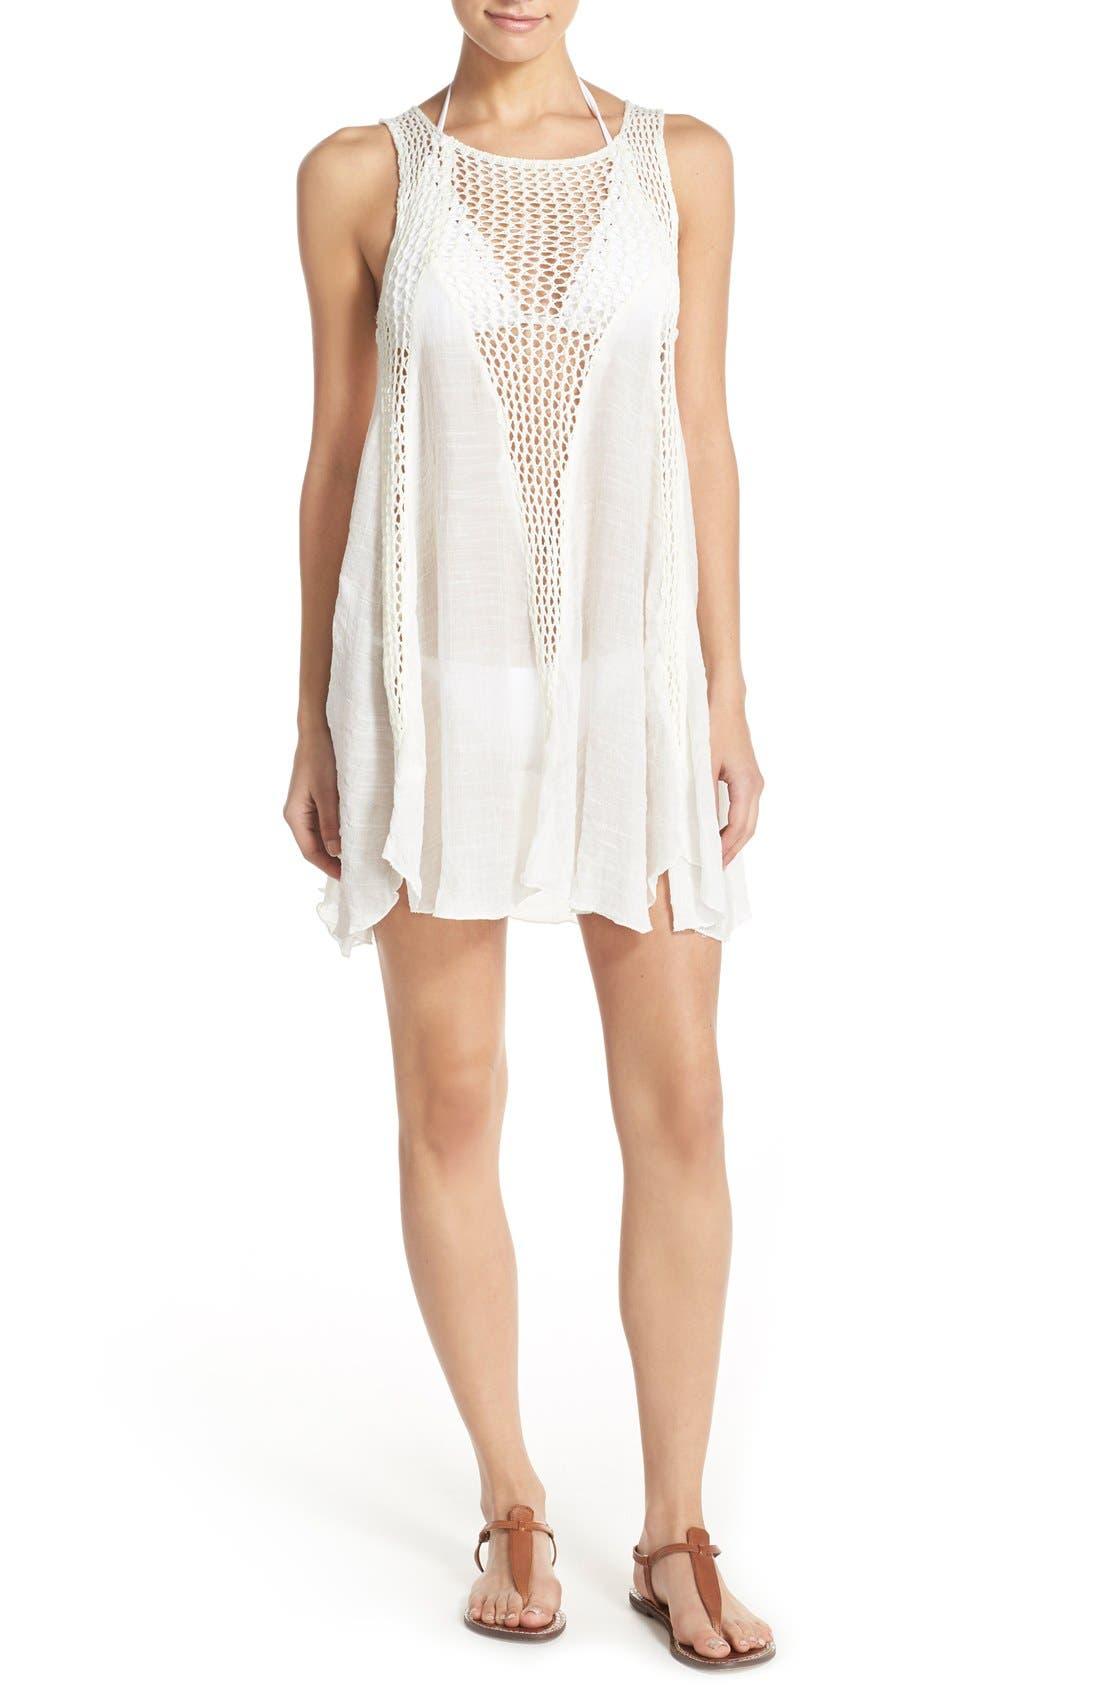 Main Image - Elan Crochet Inset Cover-Up Dress